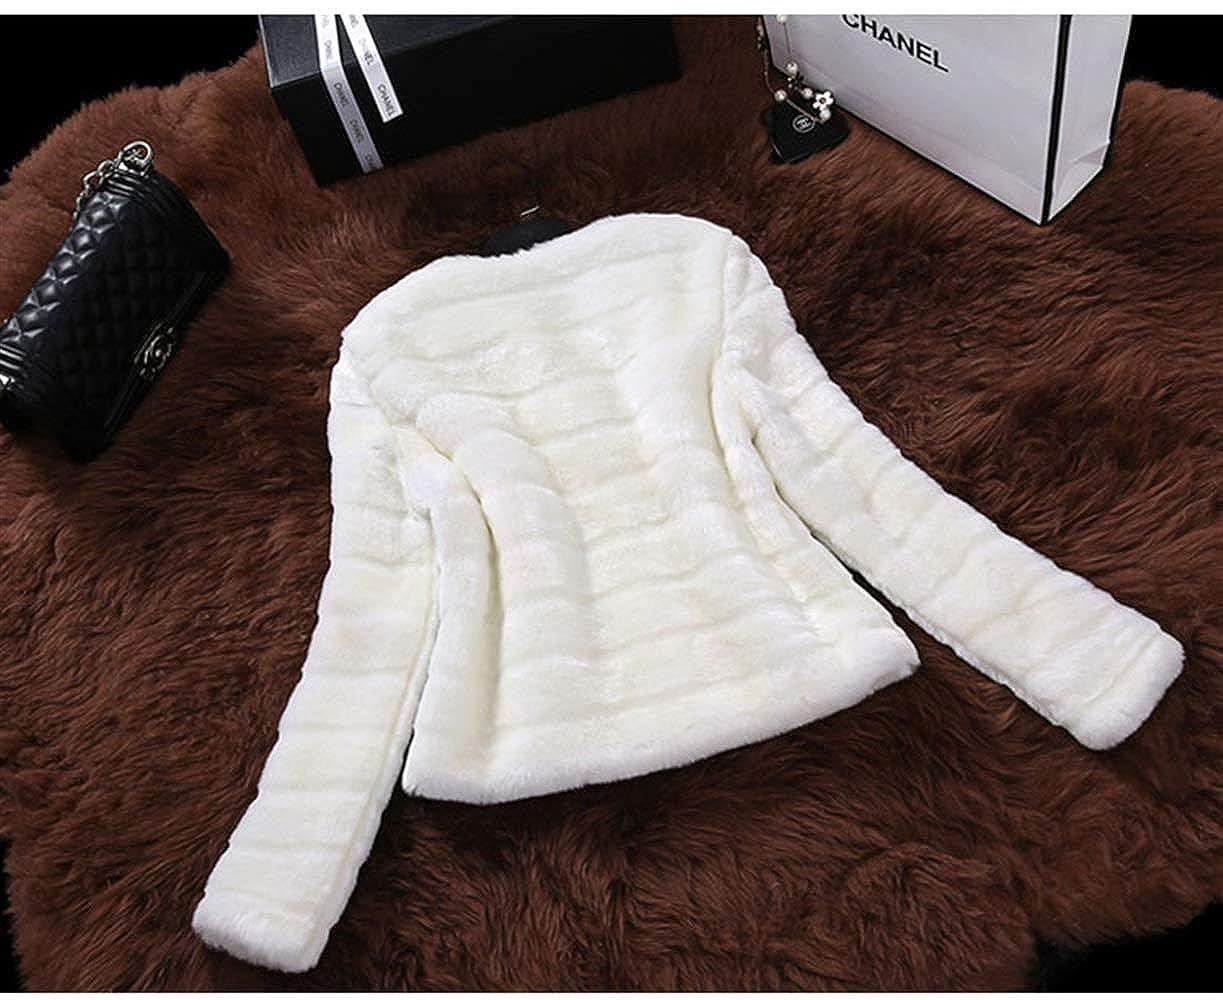 Kunstpelz Mantel Damen Langarm Rundhals Warm Verdicken Felljacke Herbst Perfect Pin-up Winter Fashion Elegante Casual Einfarbig Kurzmantel Pelzjacke Coat Style